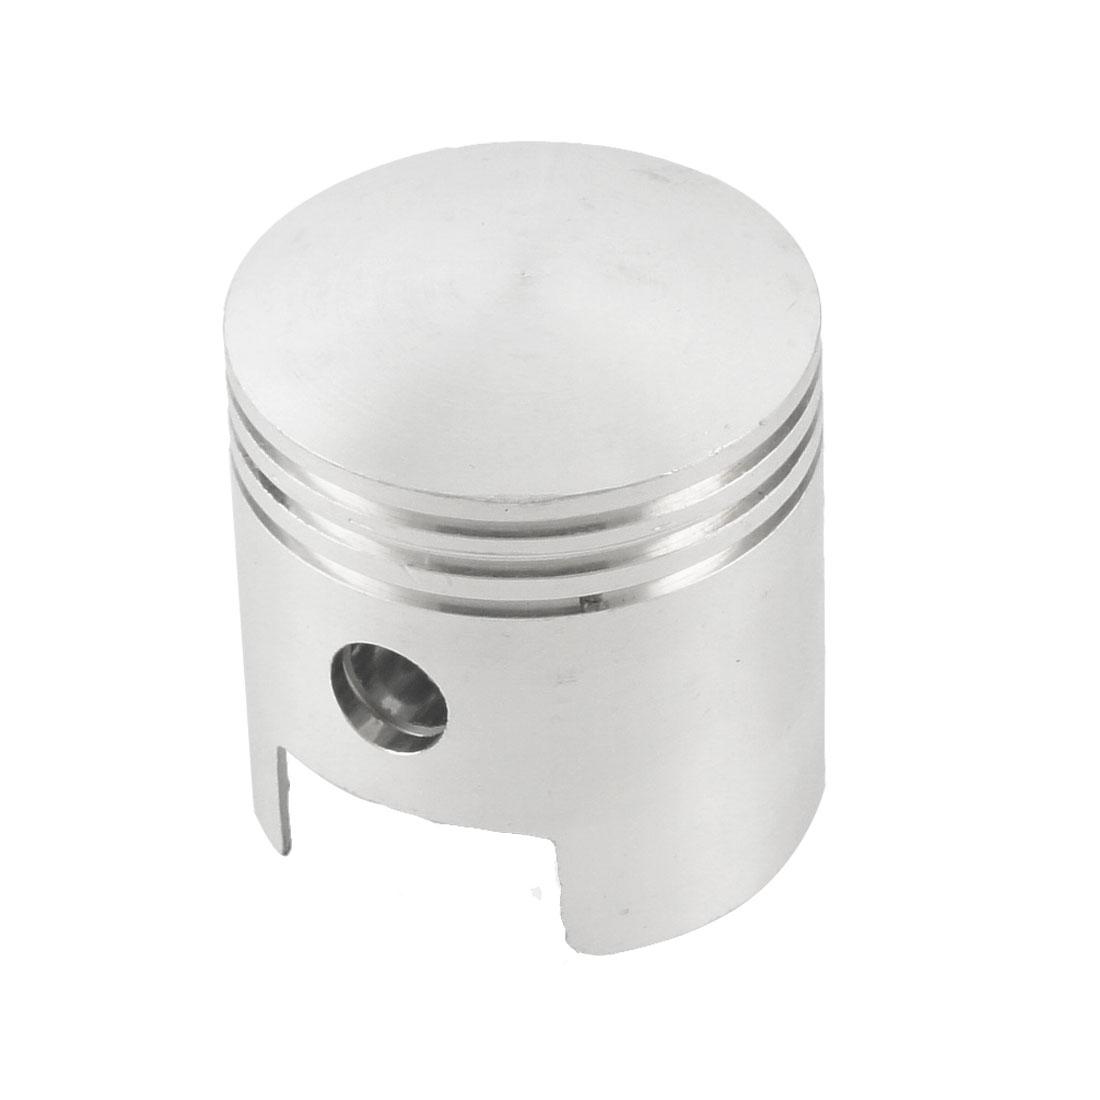 Silver Tone Aluminum Alloy 45mm x 45mm Engine Air Compressor Piston